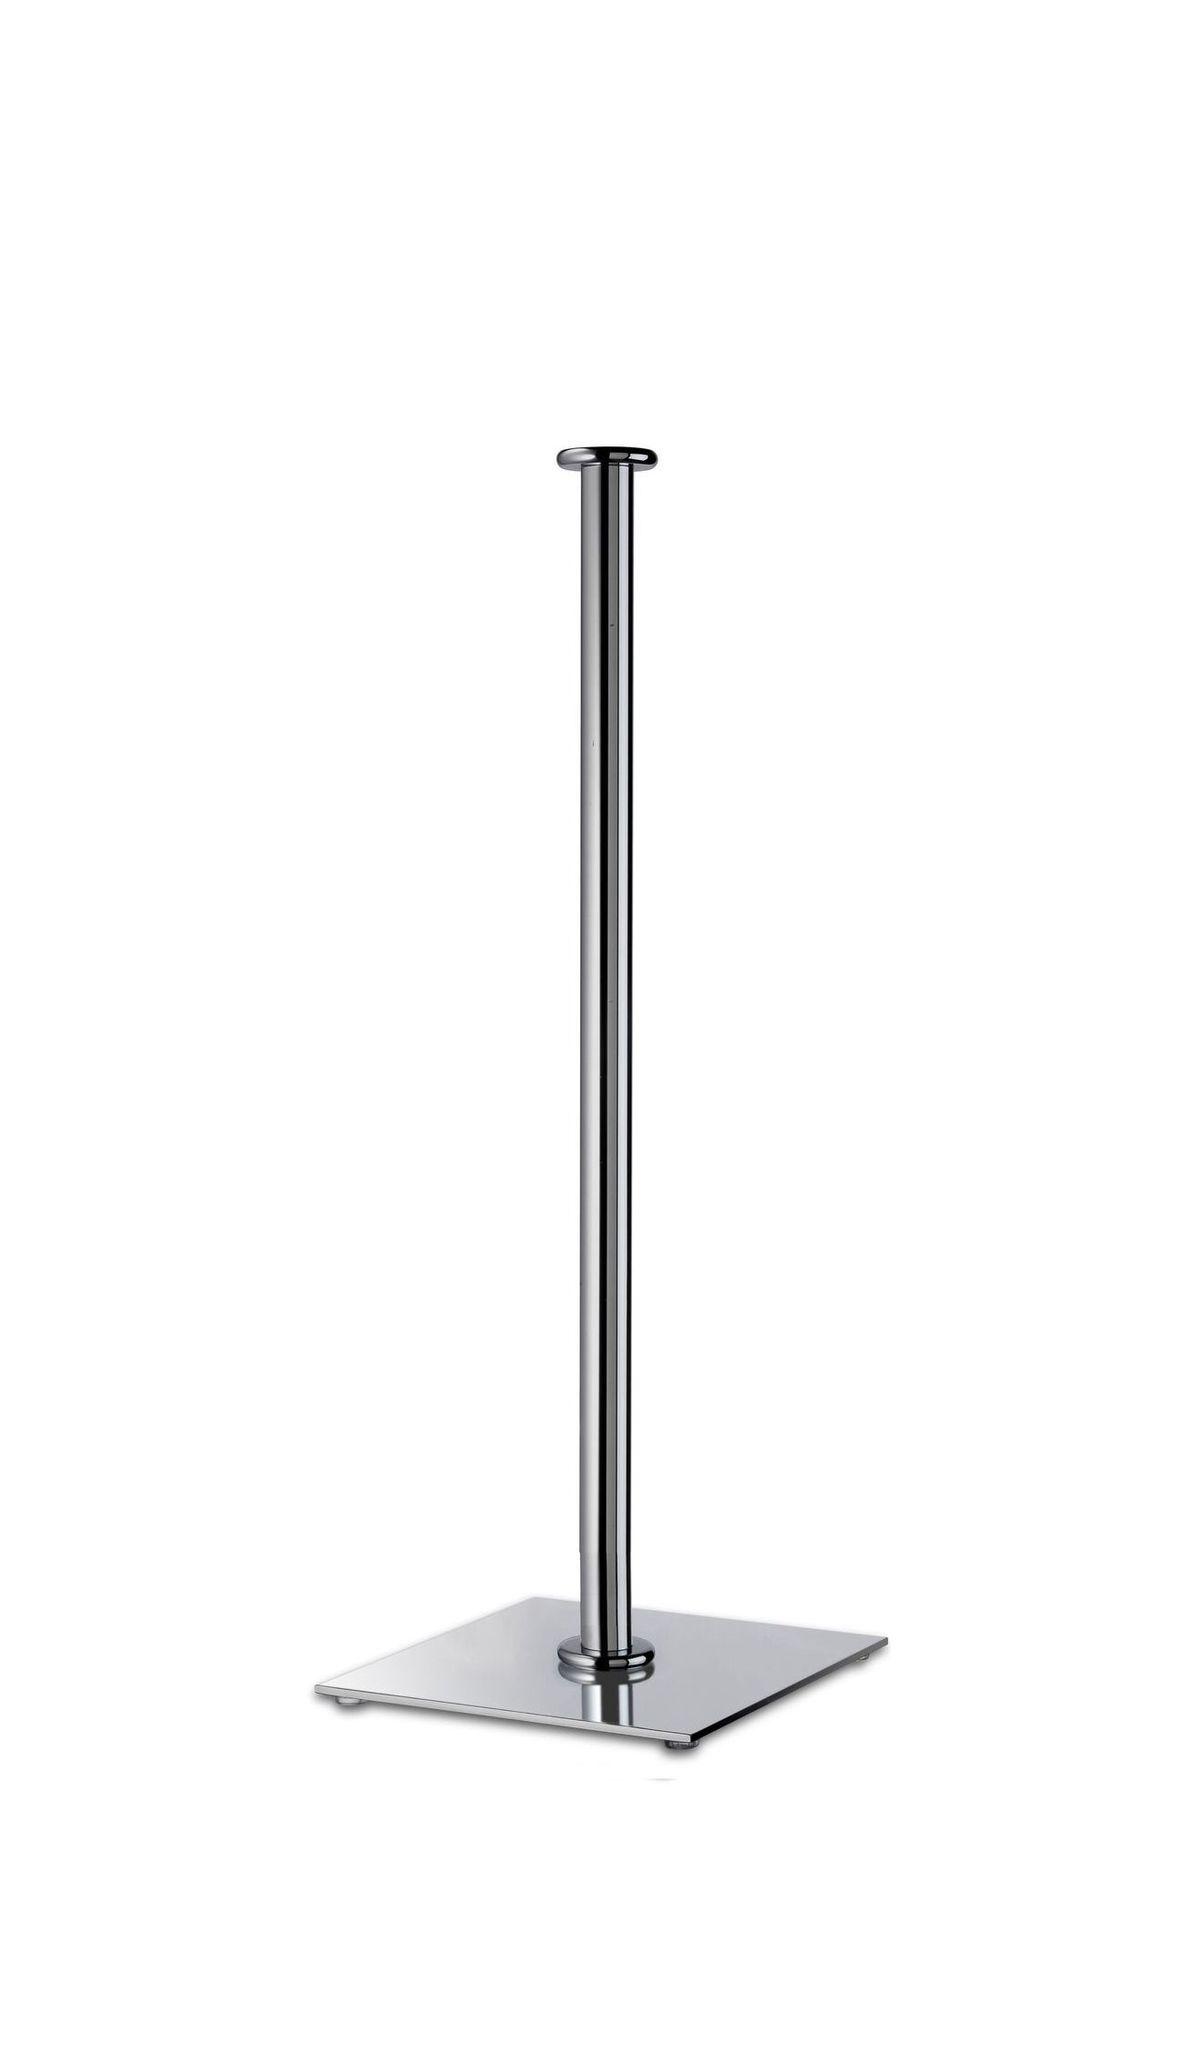 Держатели Стойка вертикальная Windisch 89123CR stoyka-vertikalnaya-89123-ot-windisch-ispaniya-chrom.jpg